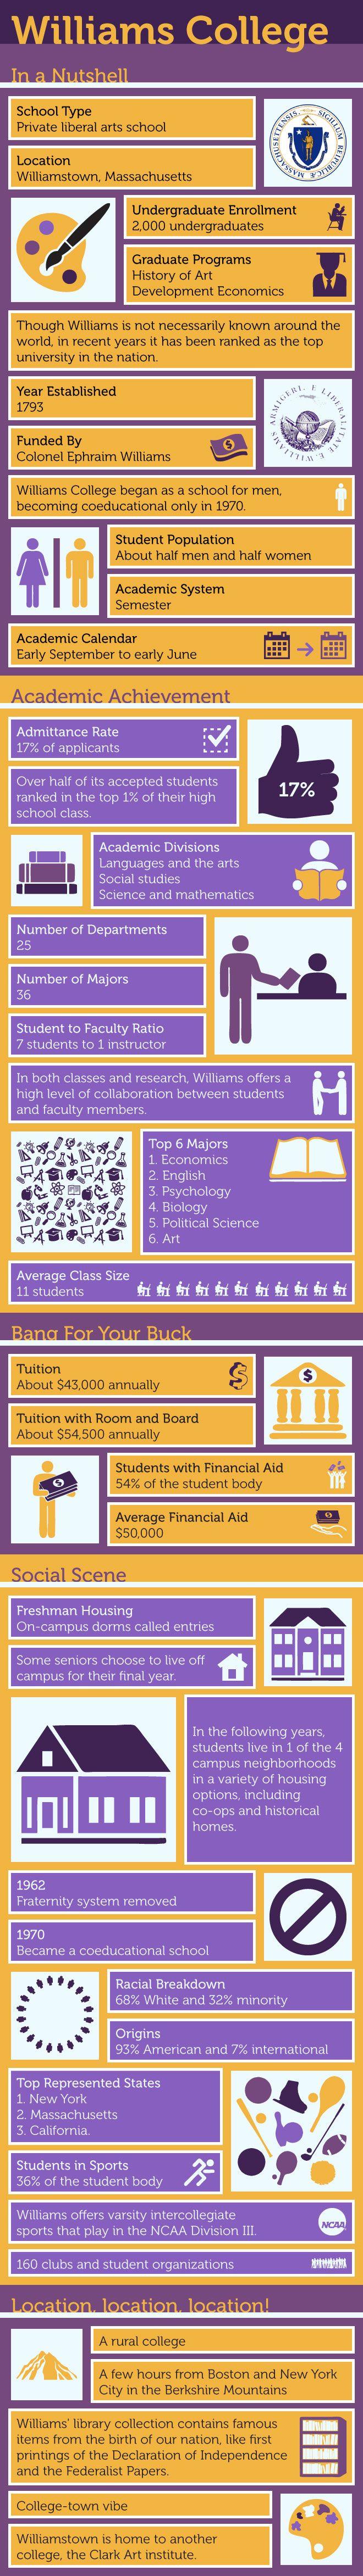 Williams College #Infographic